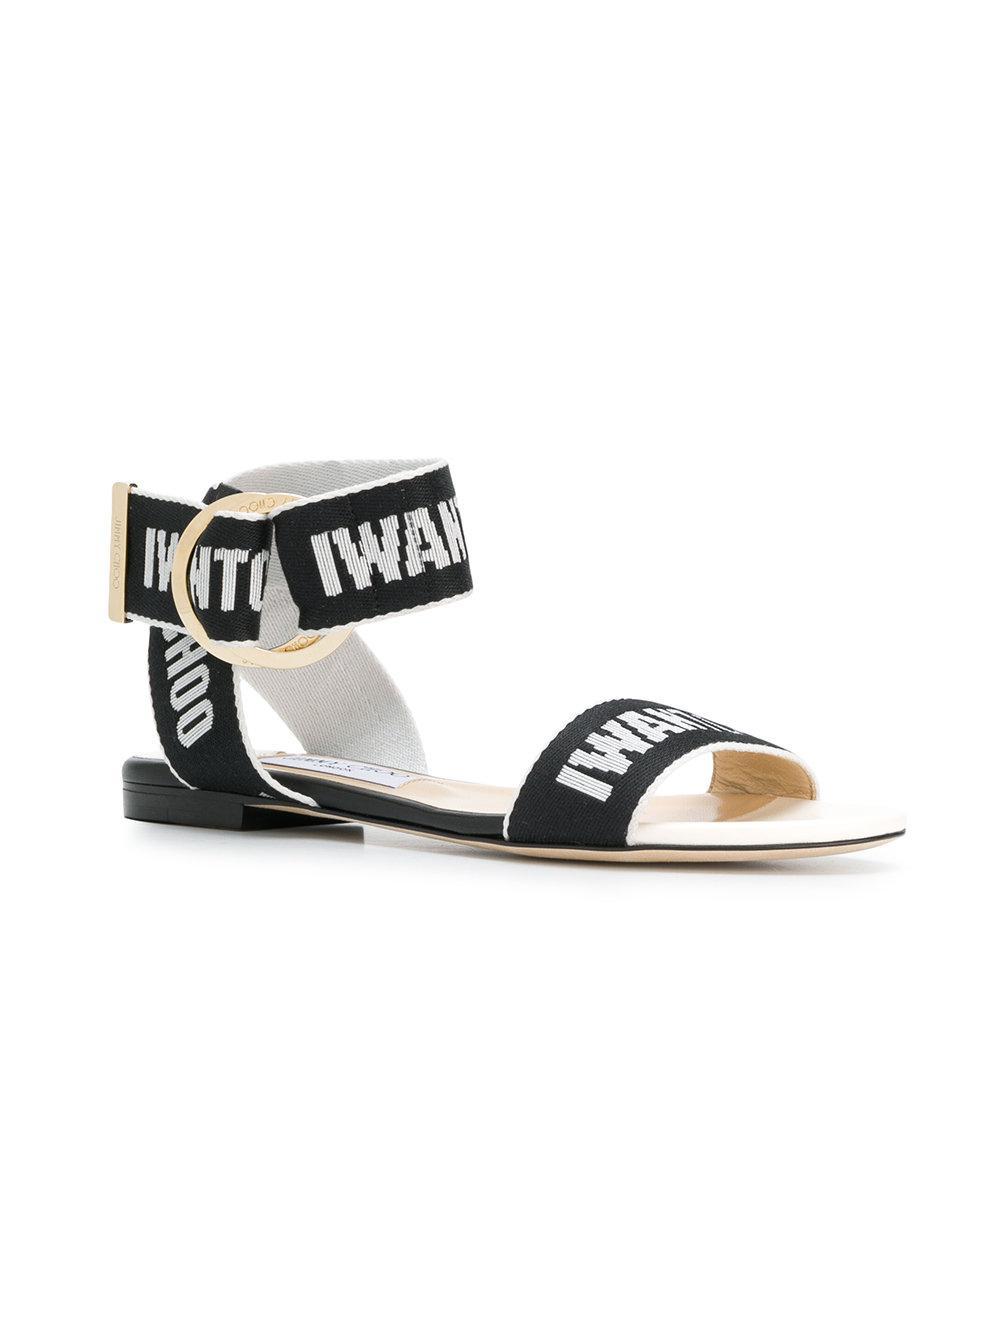 0f95786fe5e4 Lyst - Jimmy Choo Breanne Flat Sandals in Black - Save 60.0%